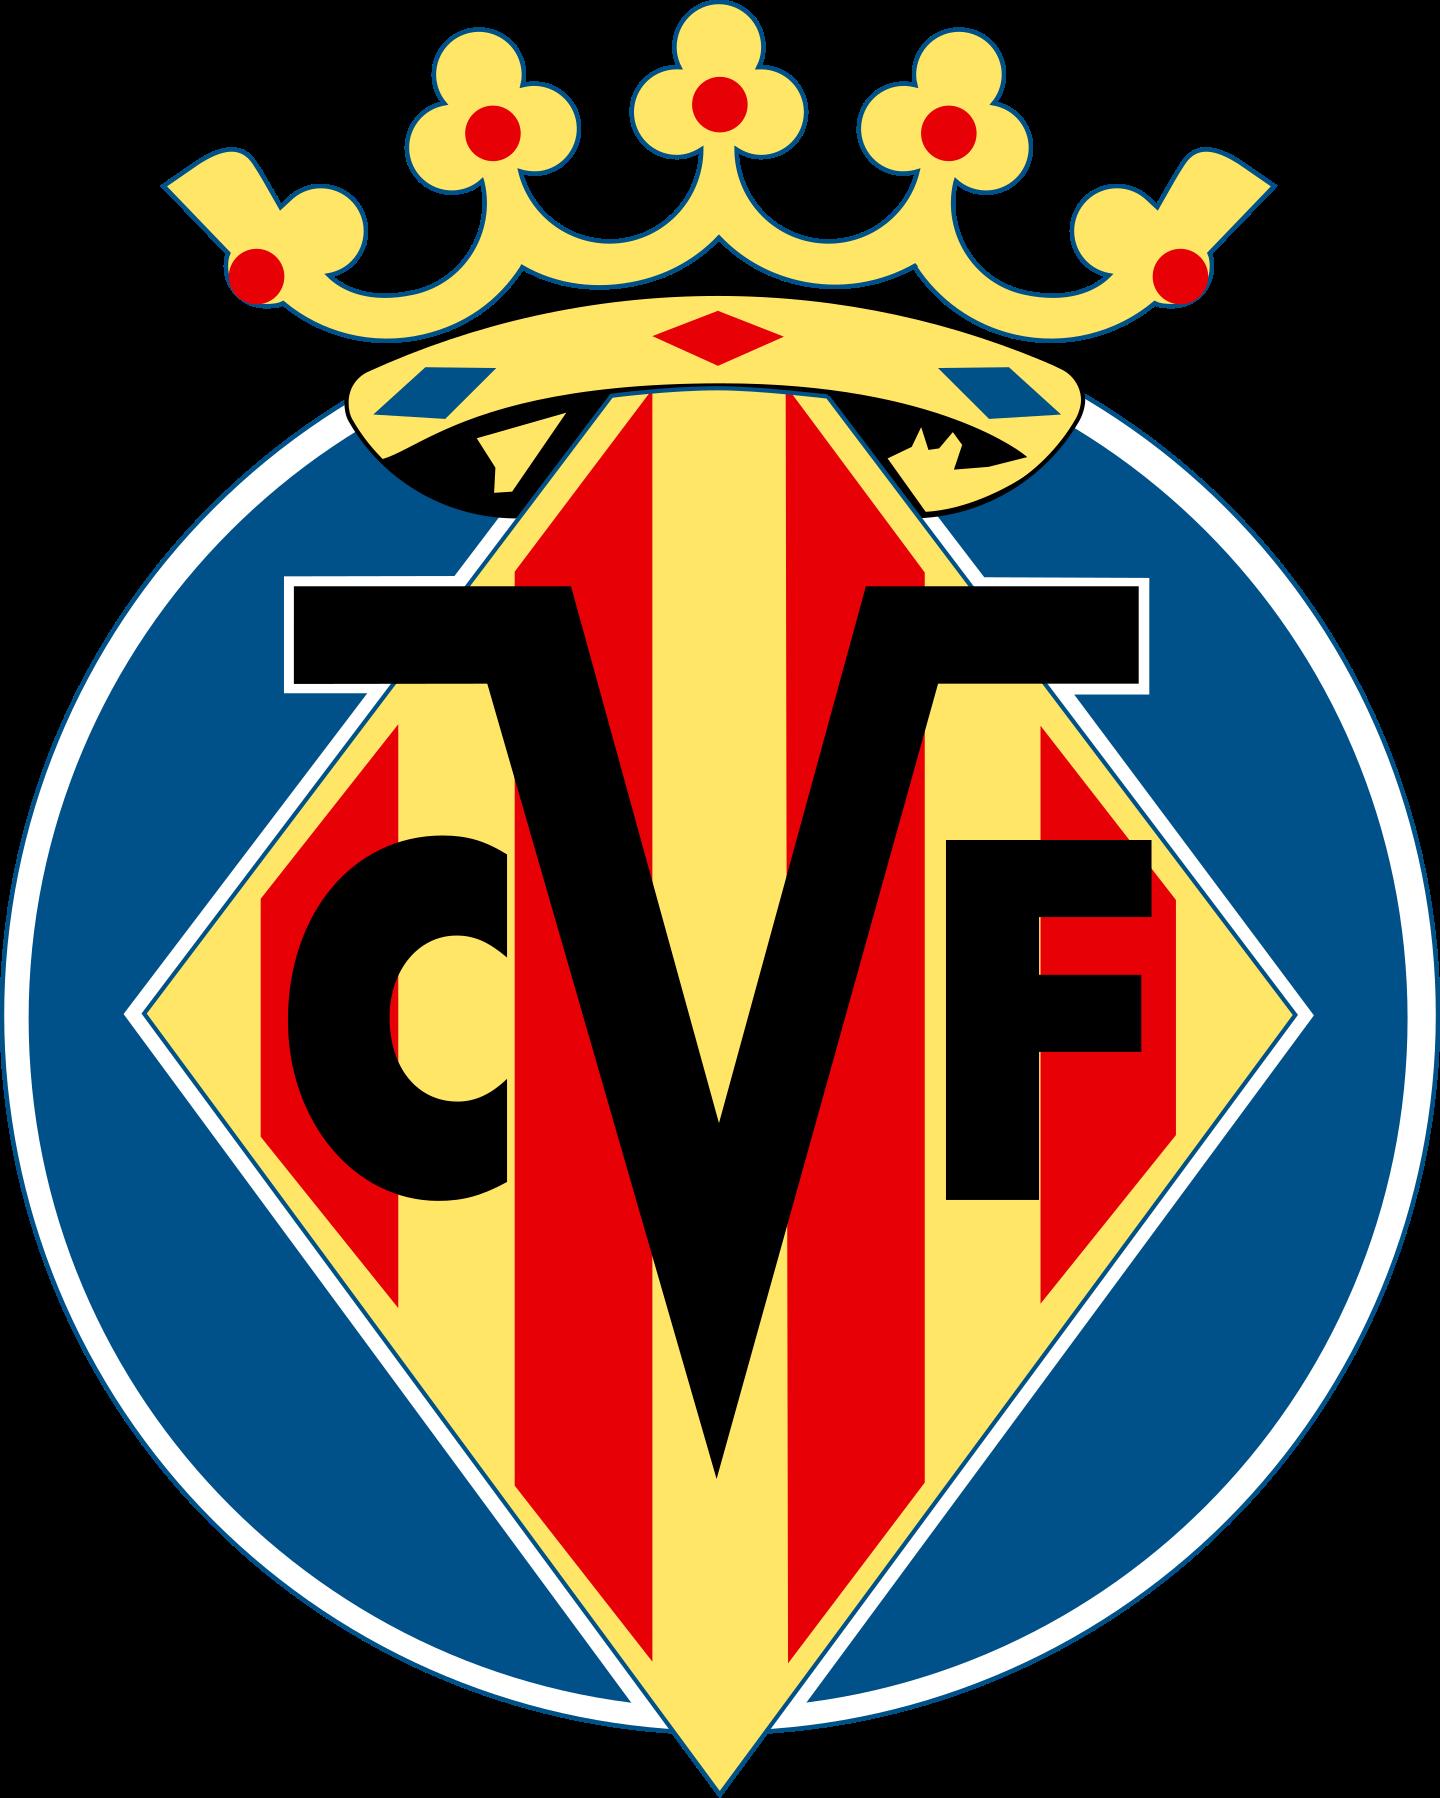 villarreal cf logo 2 - Villarreal CF Logo